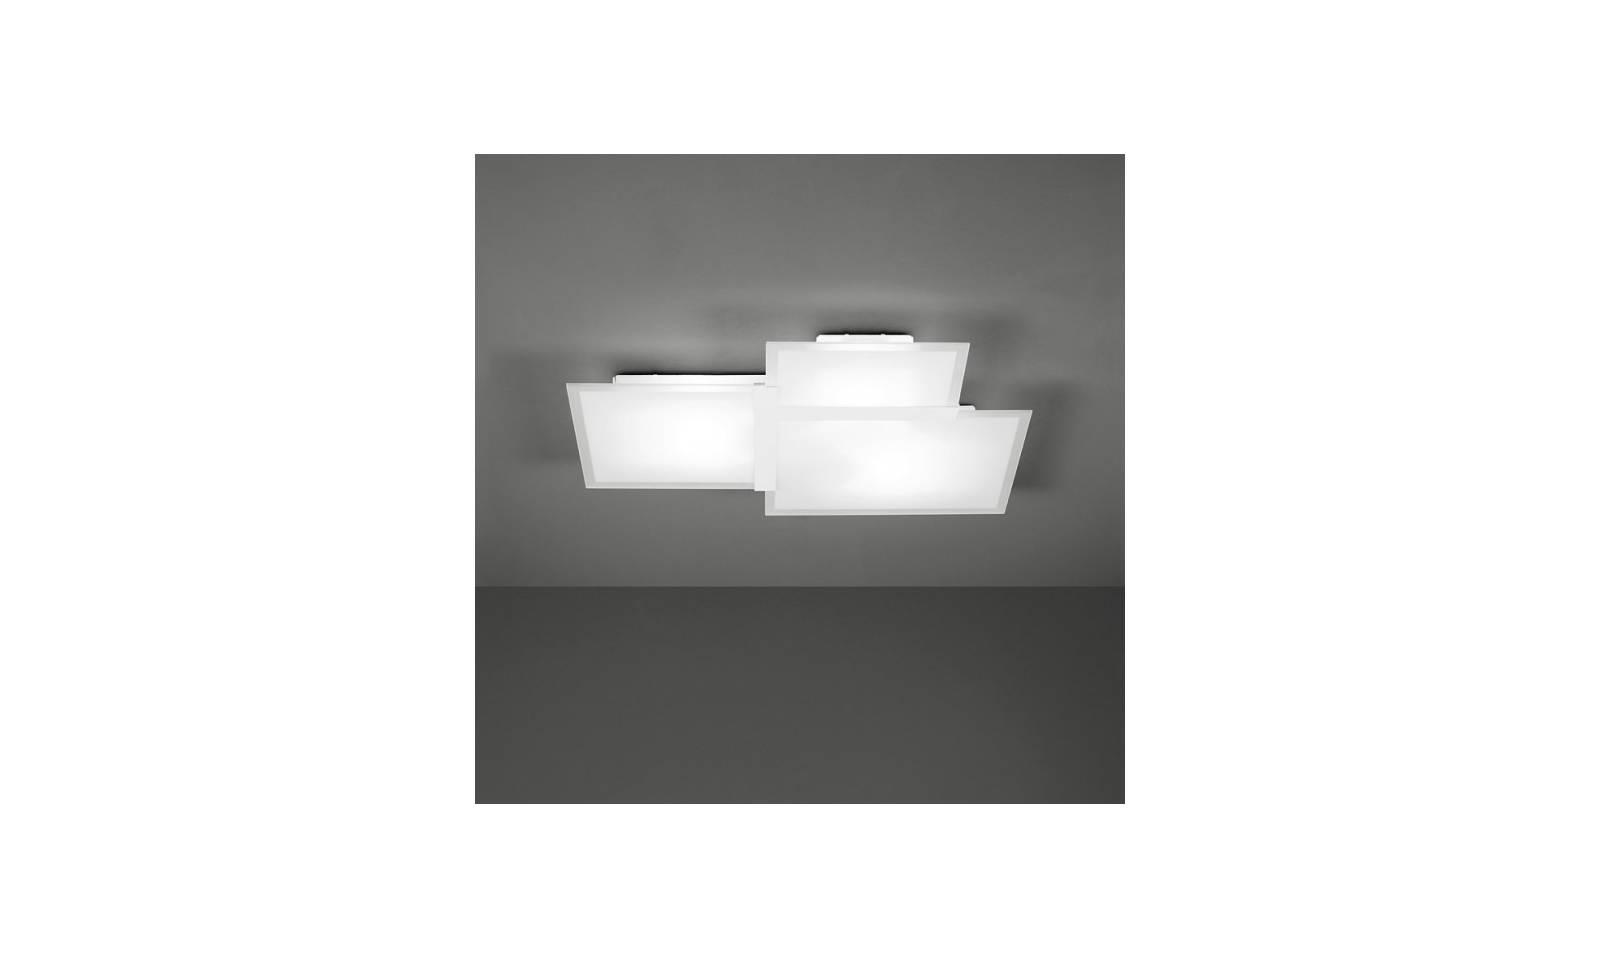 Plafoniere A Soffitto In Gesso : Sforzin beleuchtung deckenleuchte triquadro moderne lampe